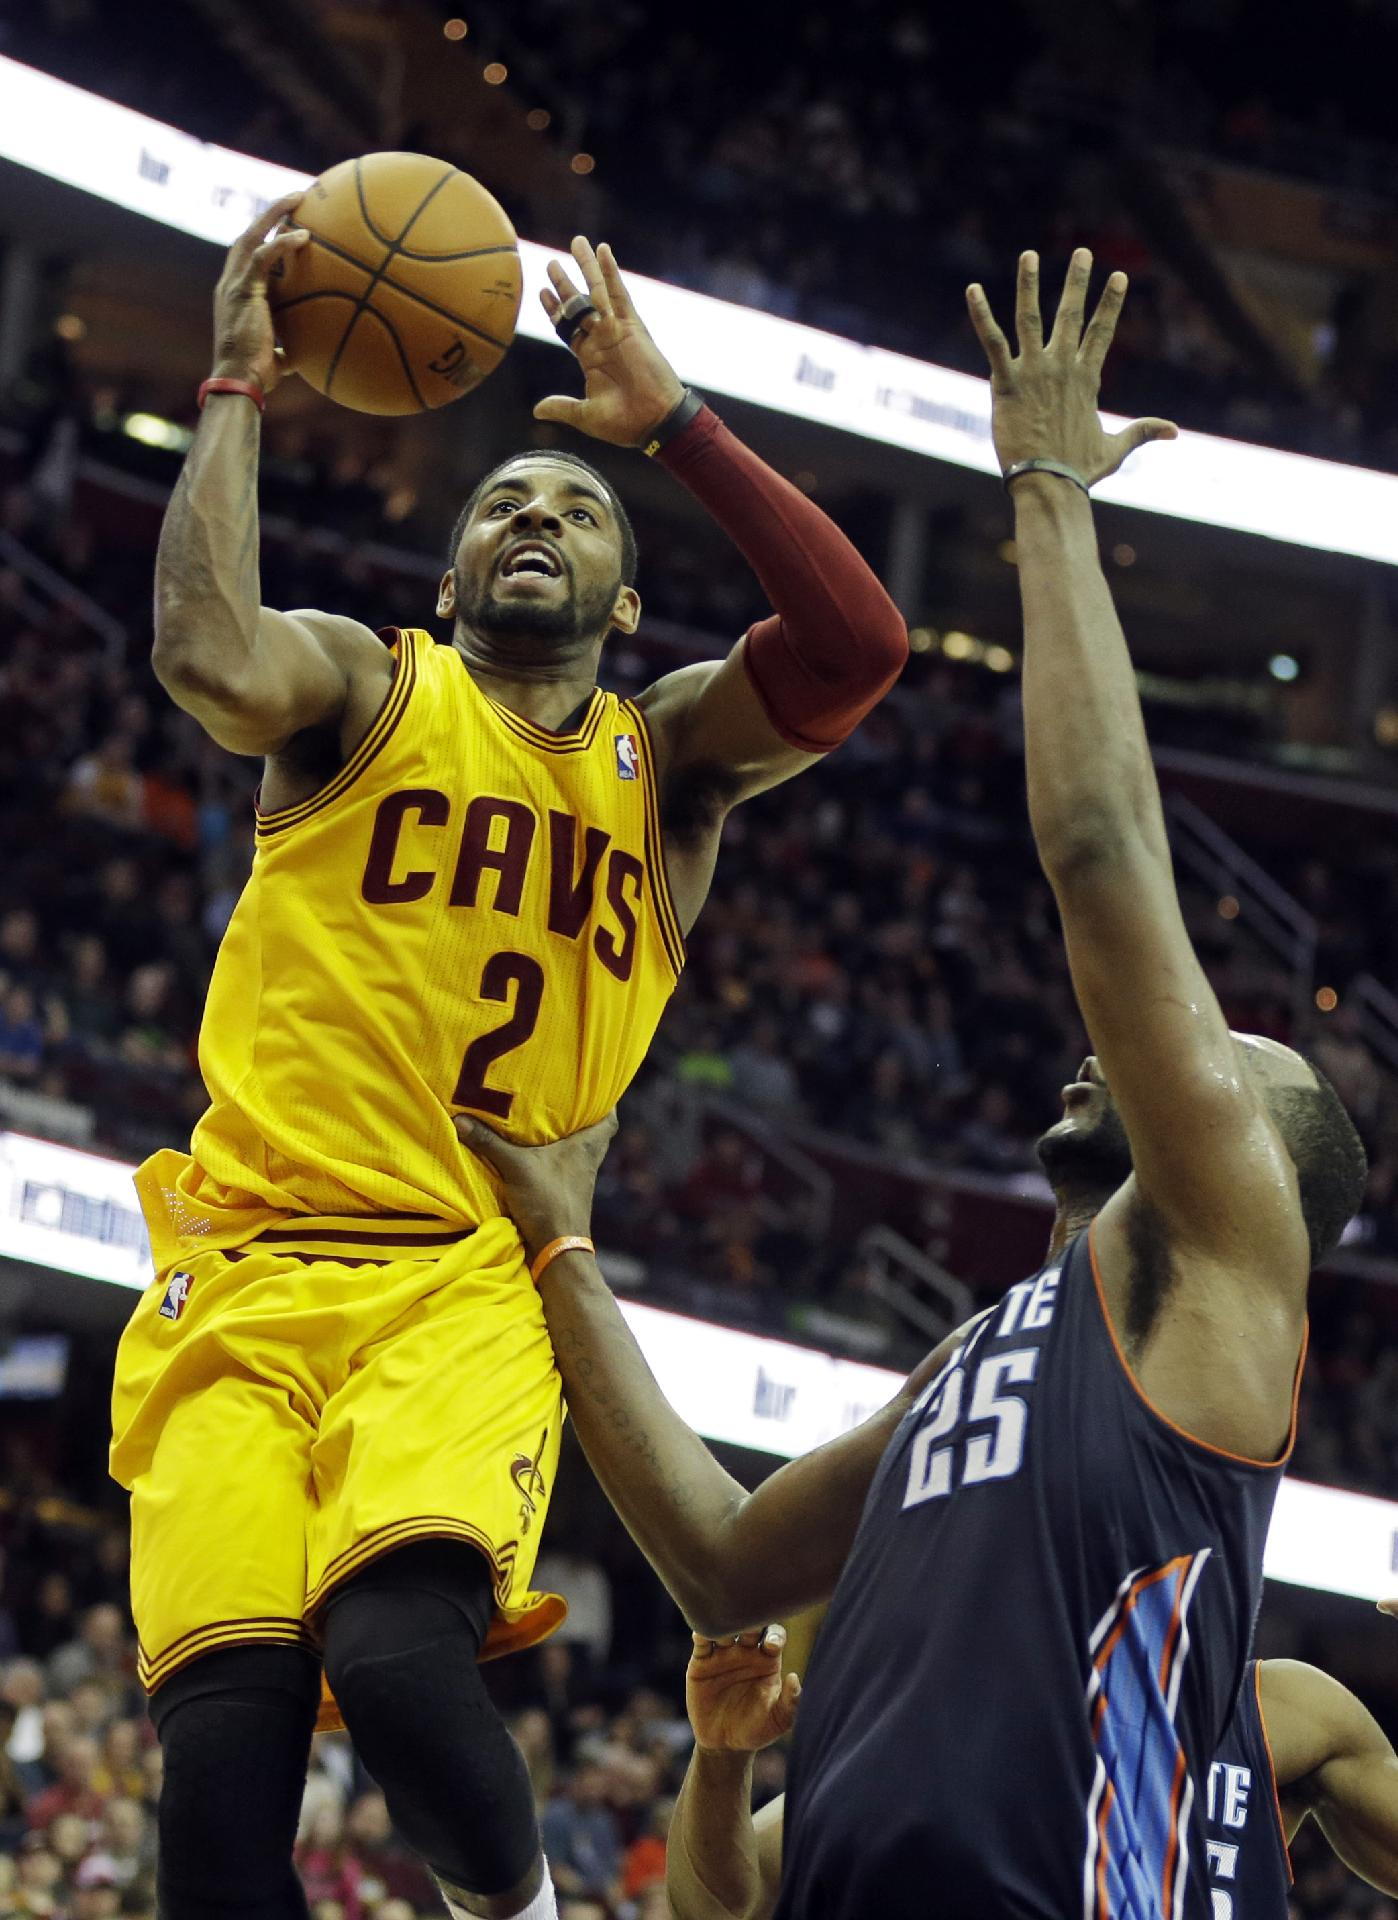 Cleveland clash: Irving, Gordon in media spat